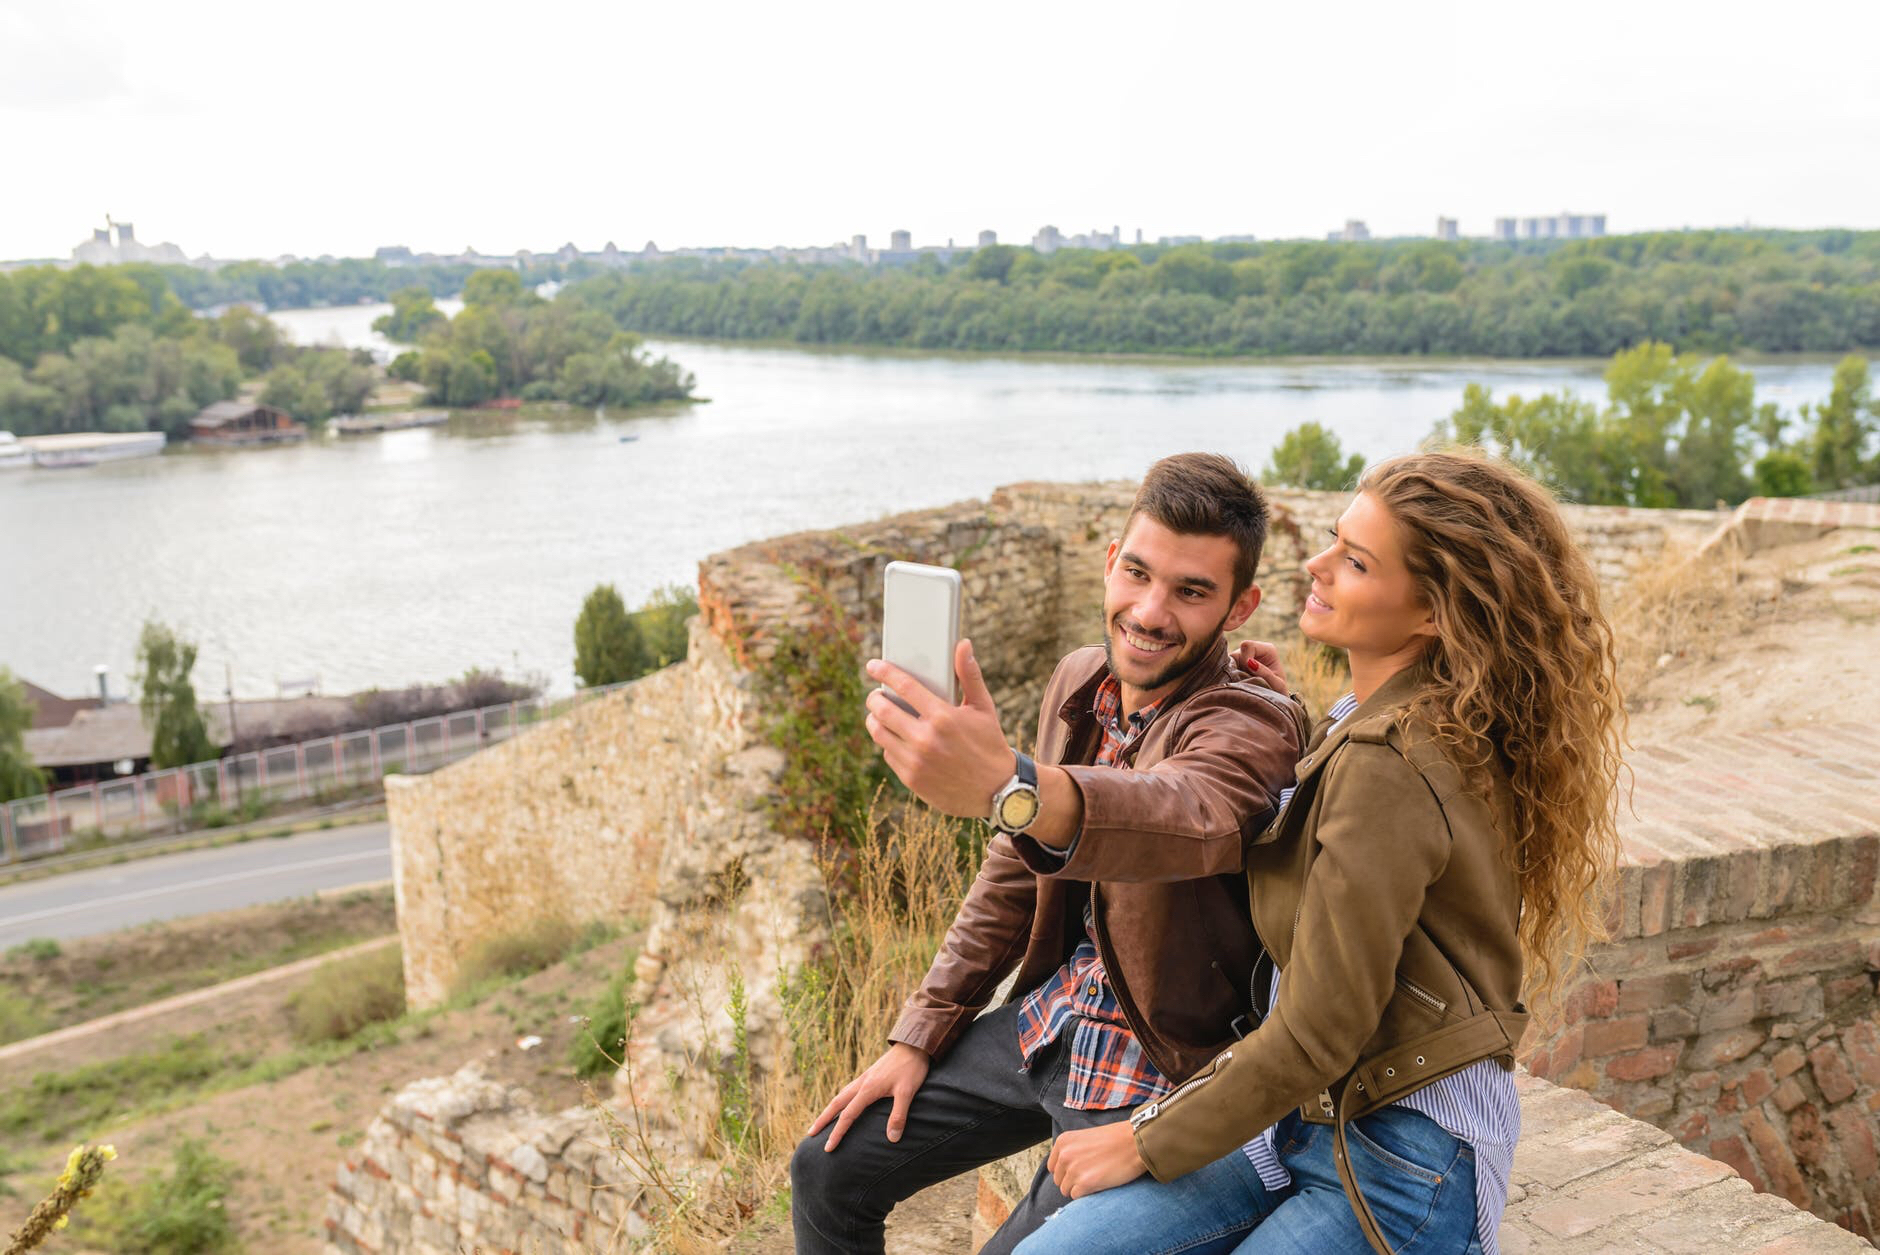 Couple takes a selfie